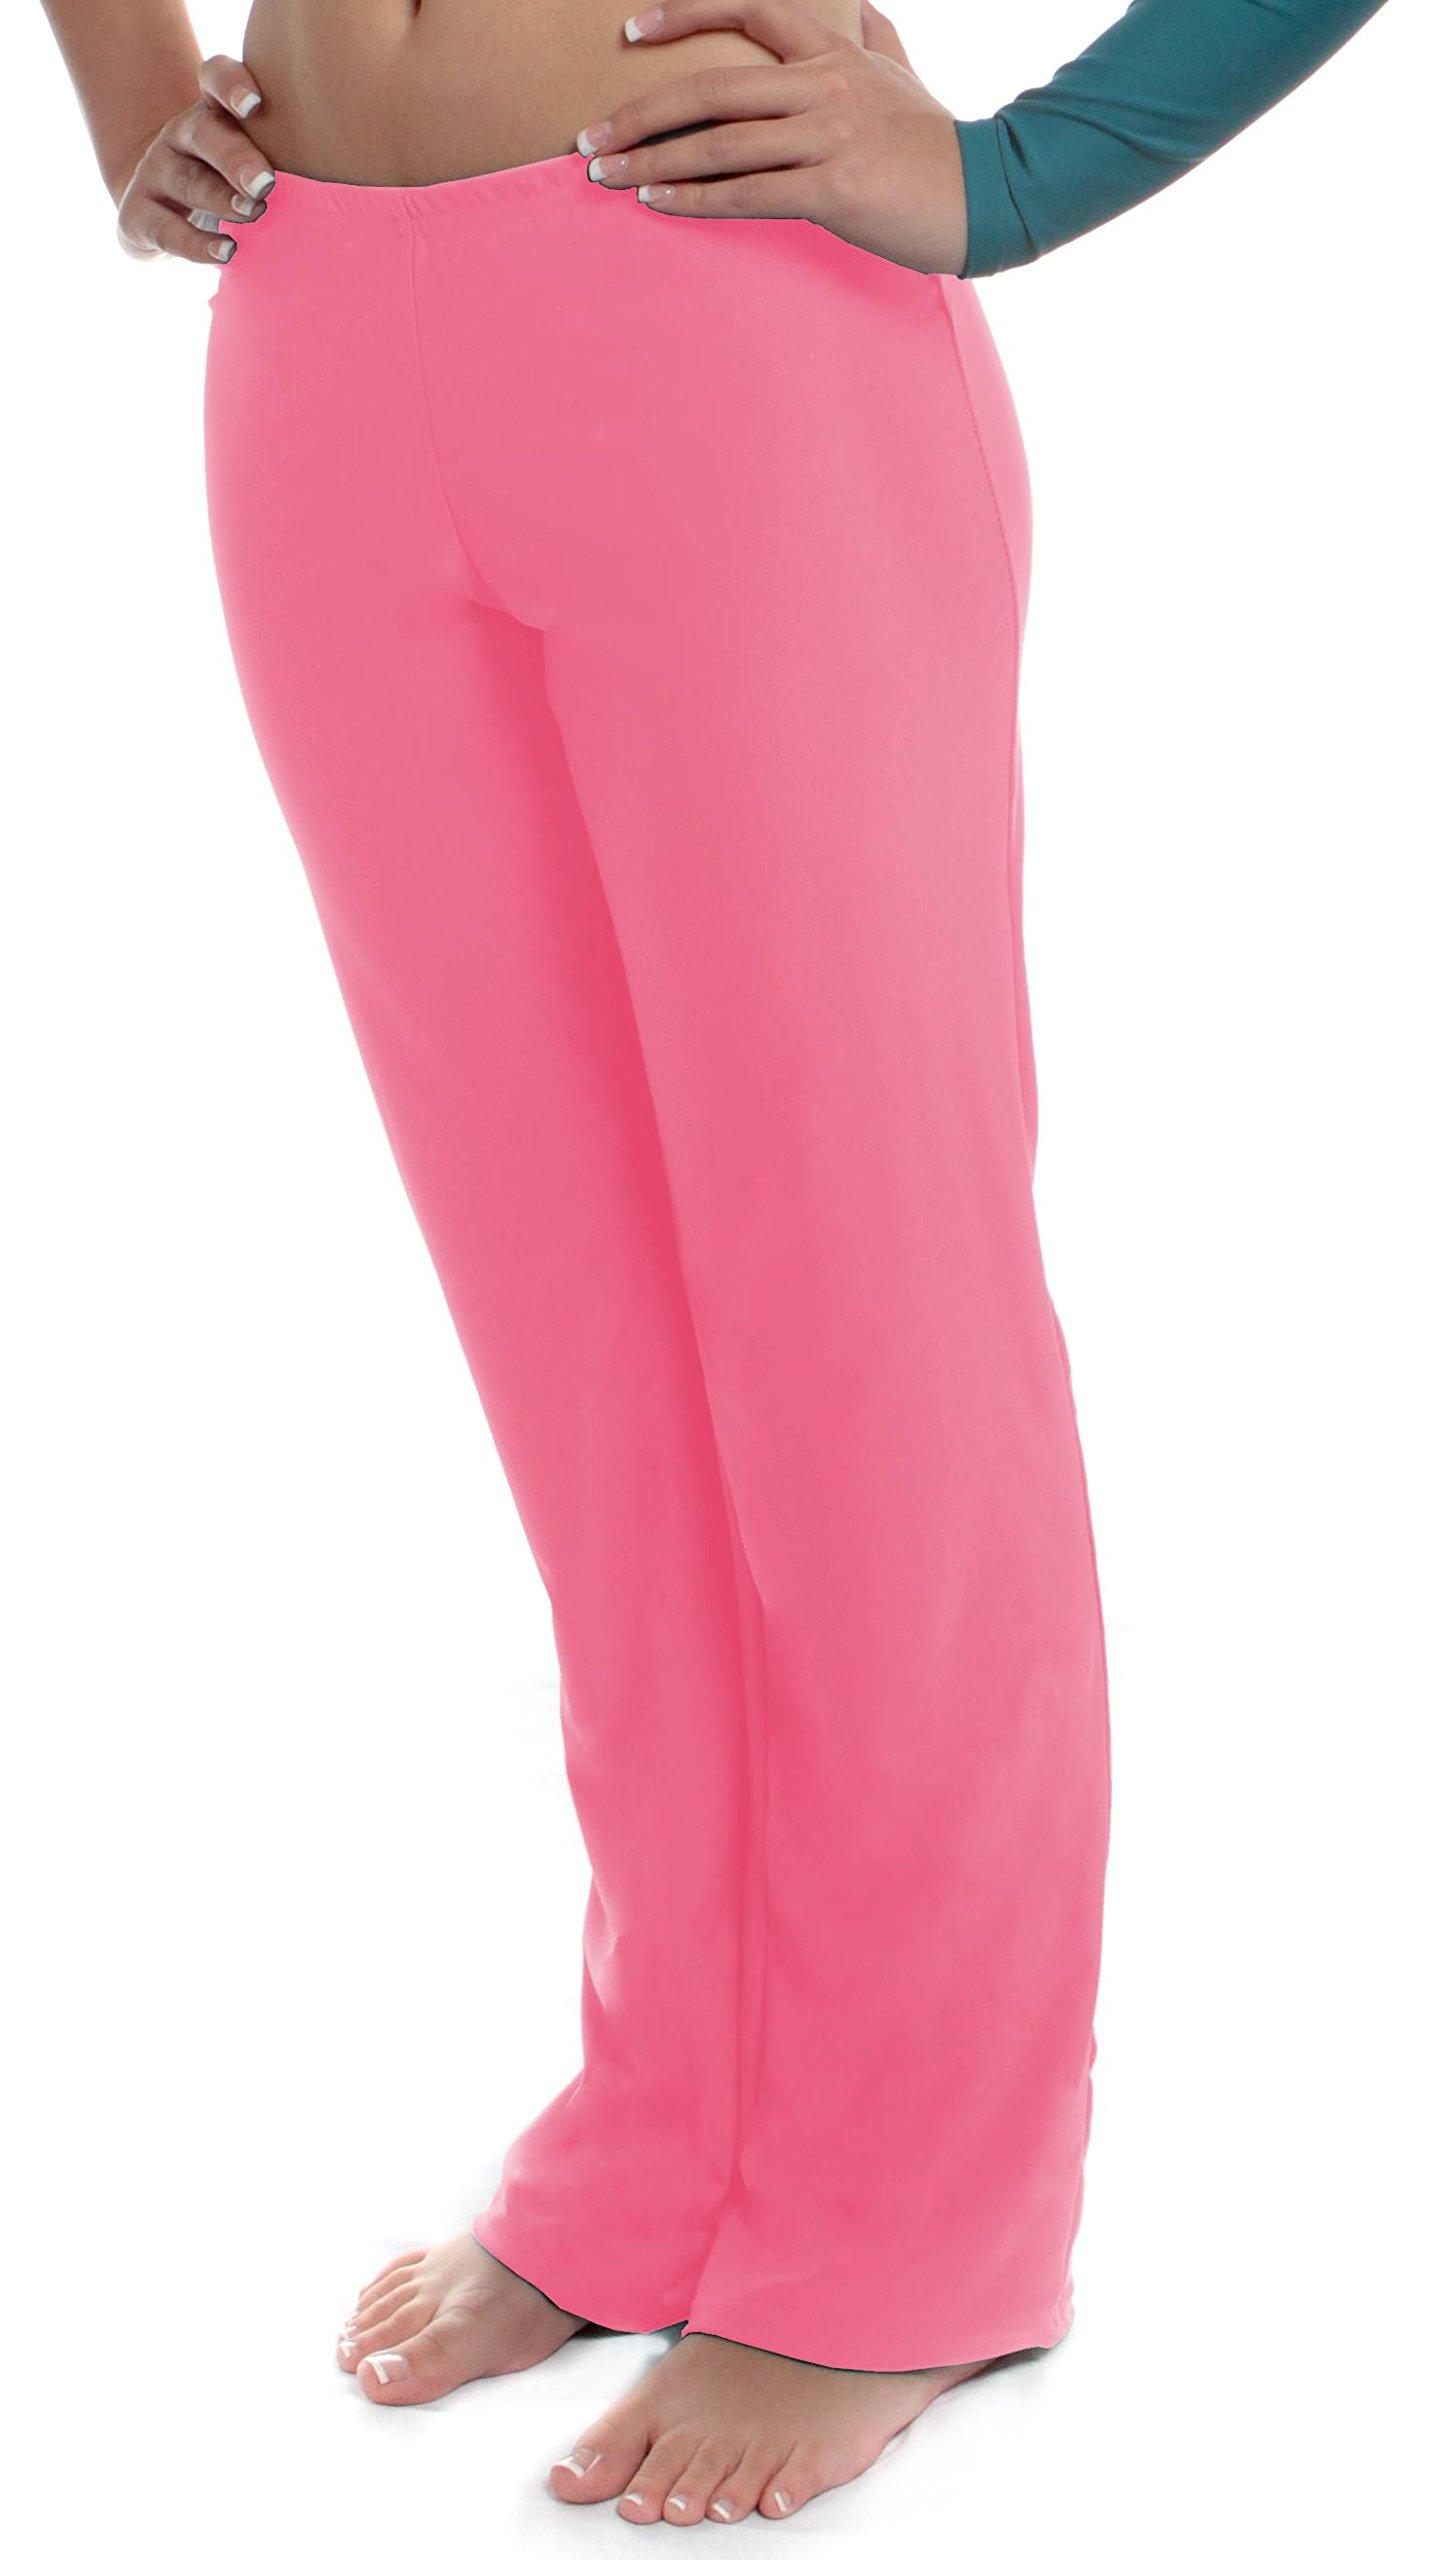 B Dancewear Girls Jazz Pants Small Pink Child and Kid Sizes by B Dancewear